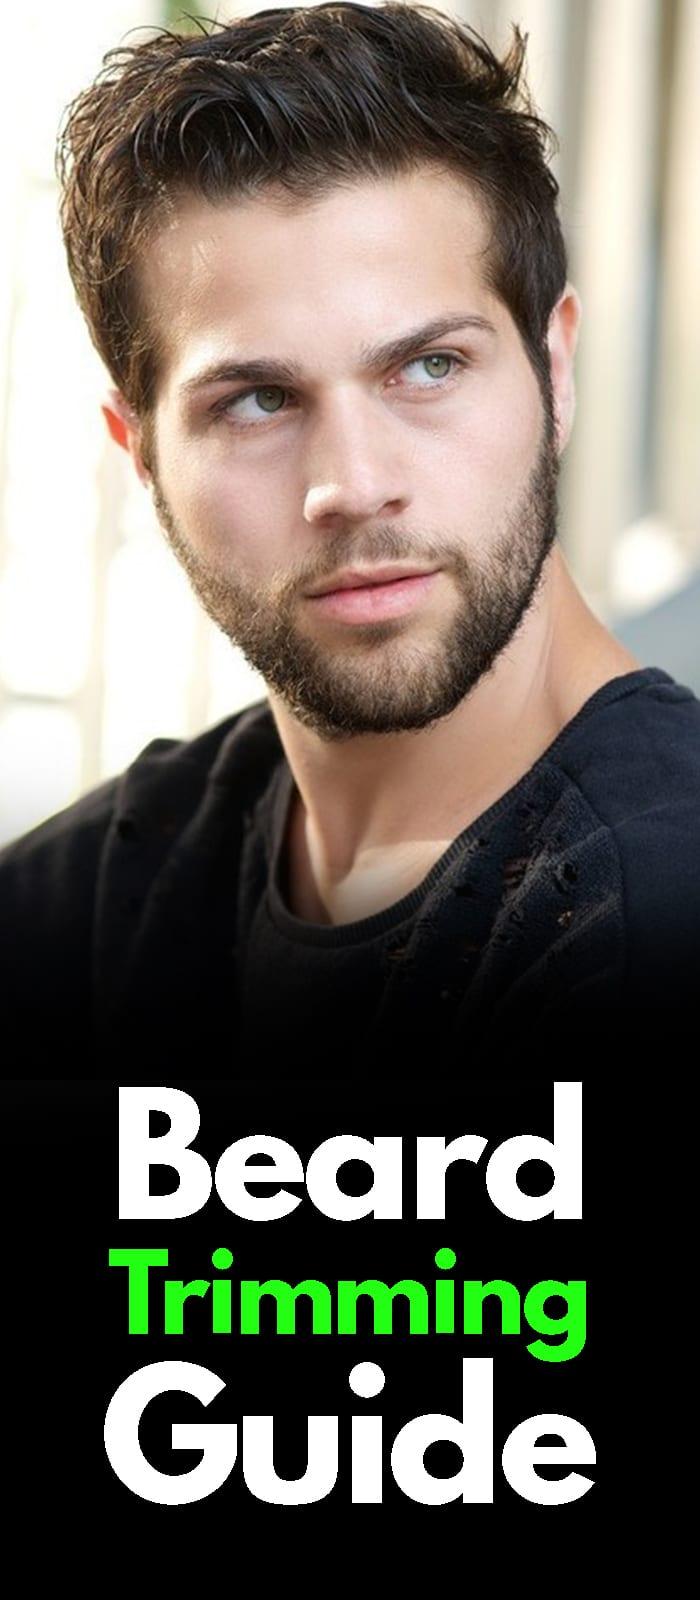 Beard Trimming Guide!